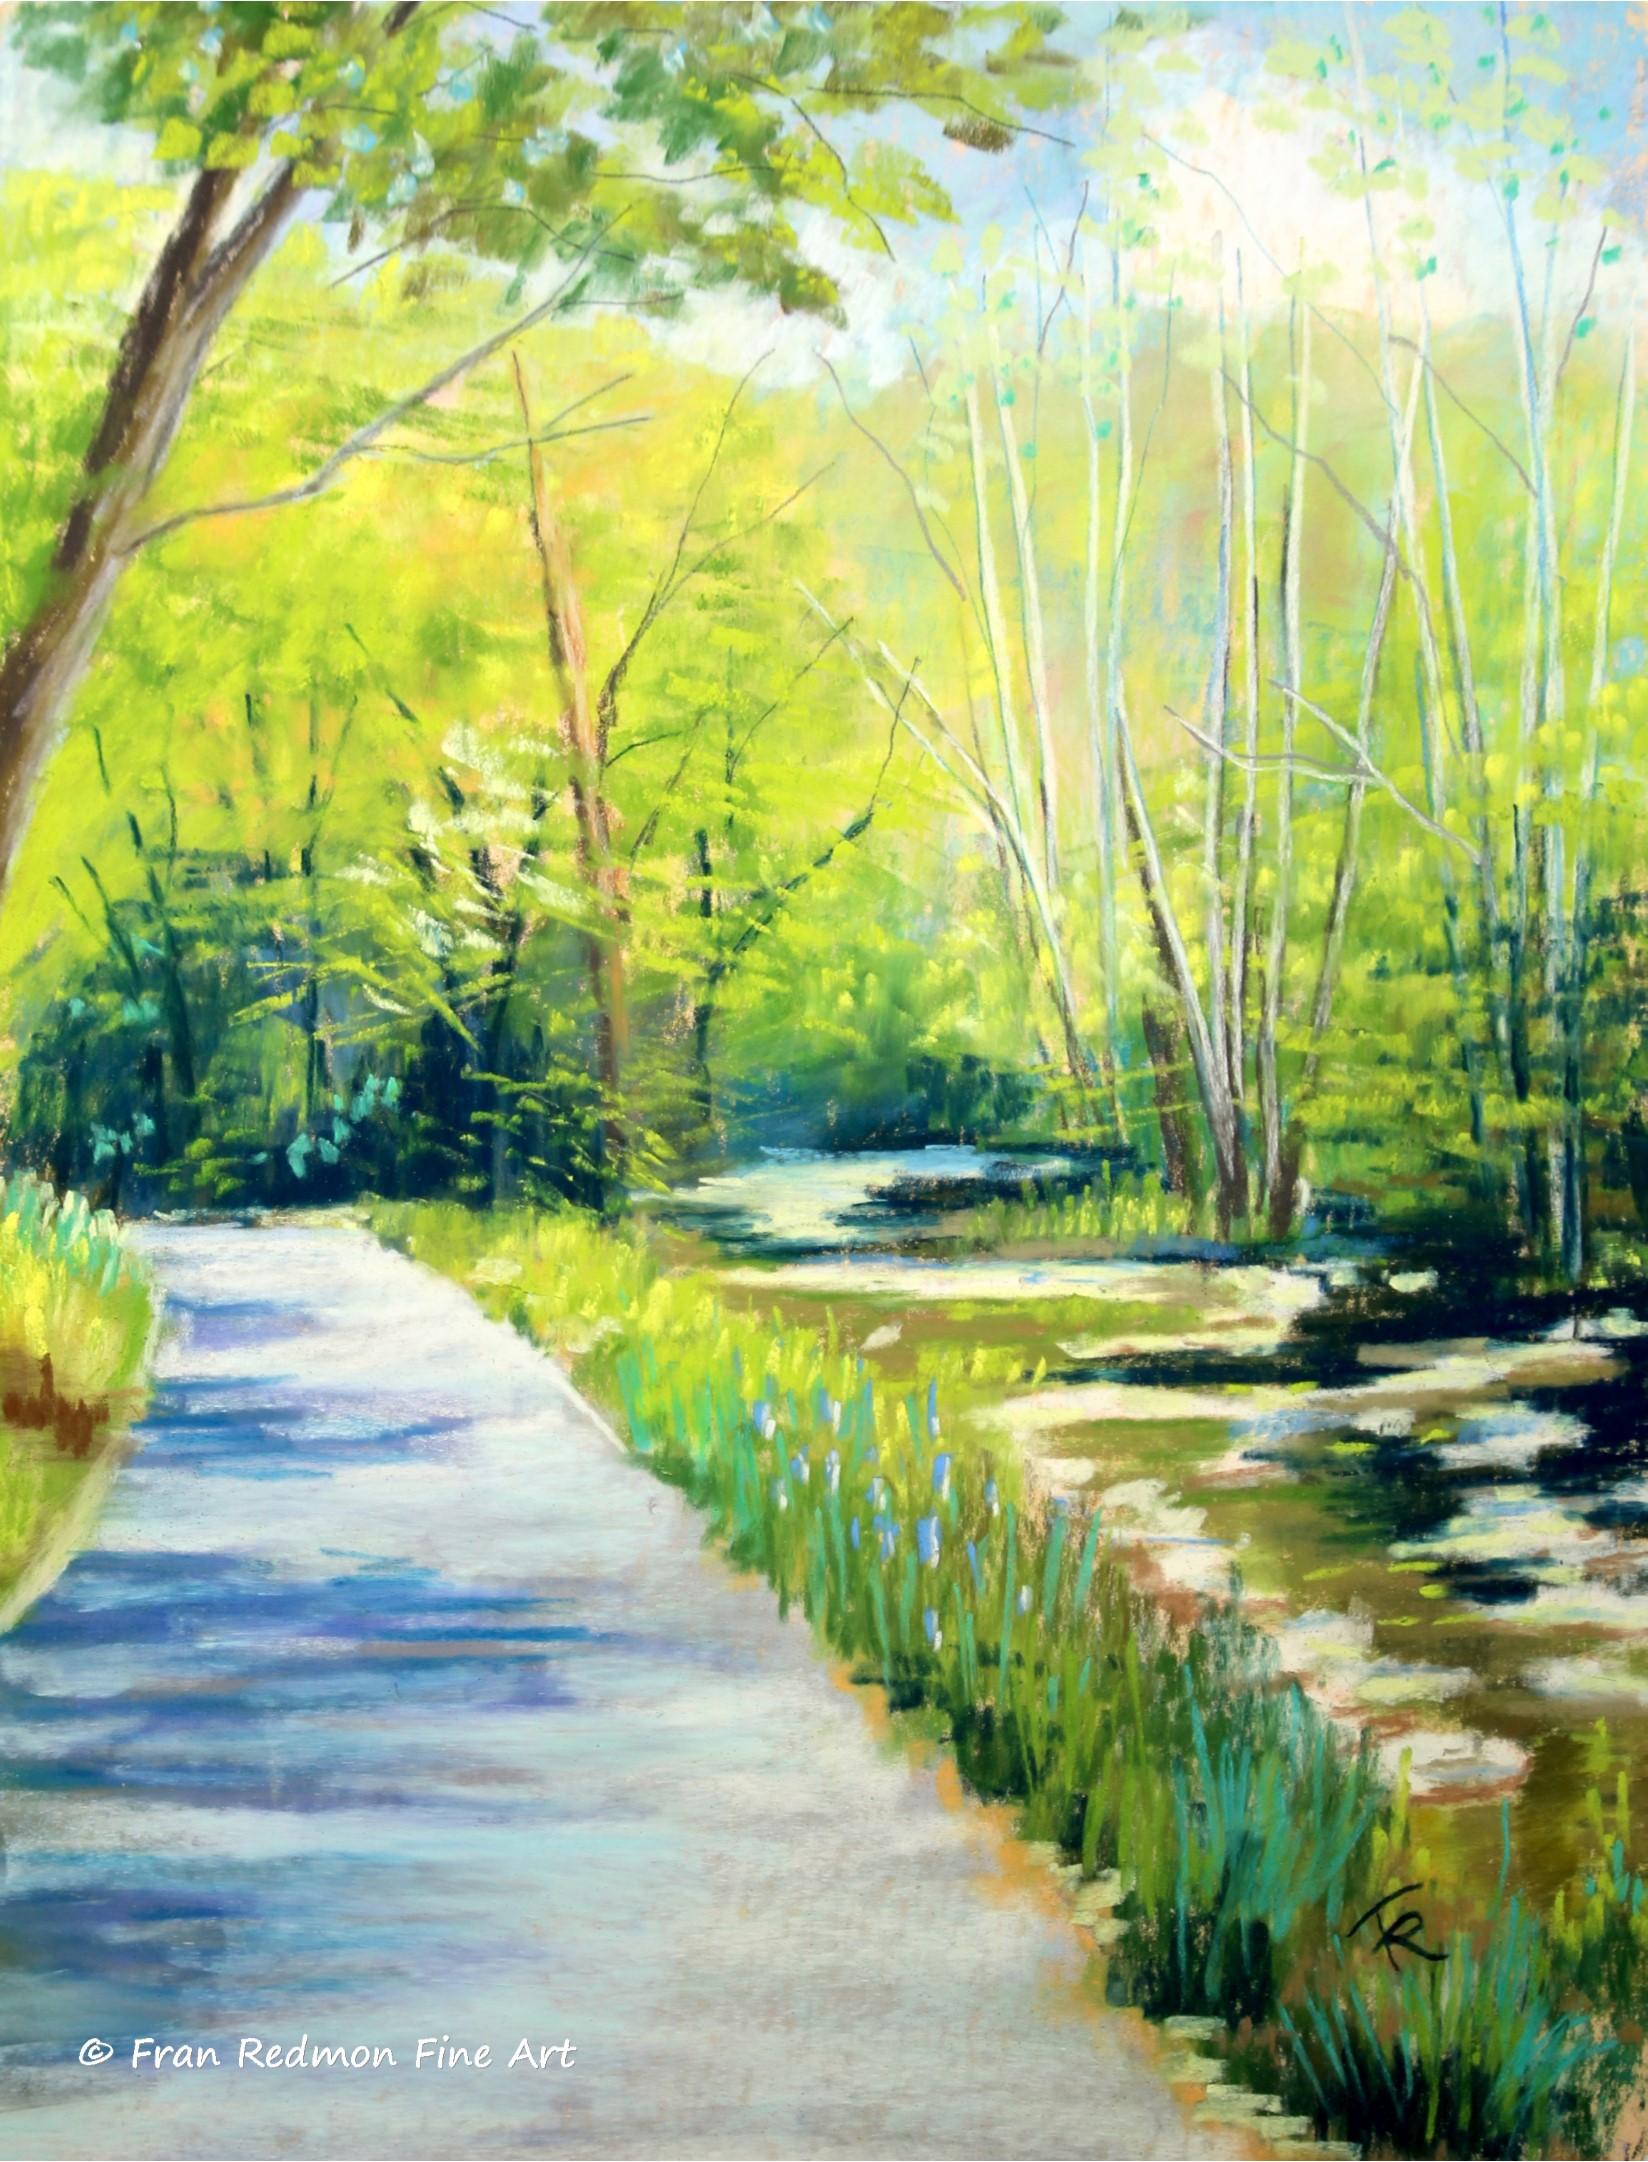 Along Little Benson Creek